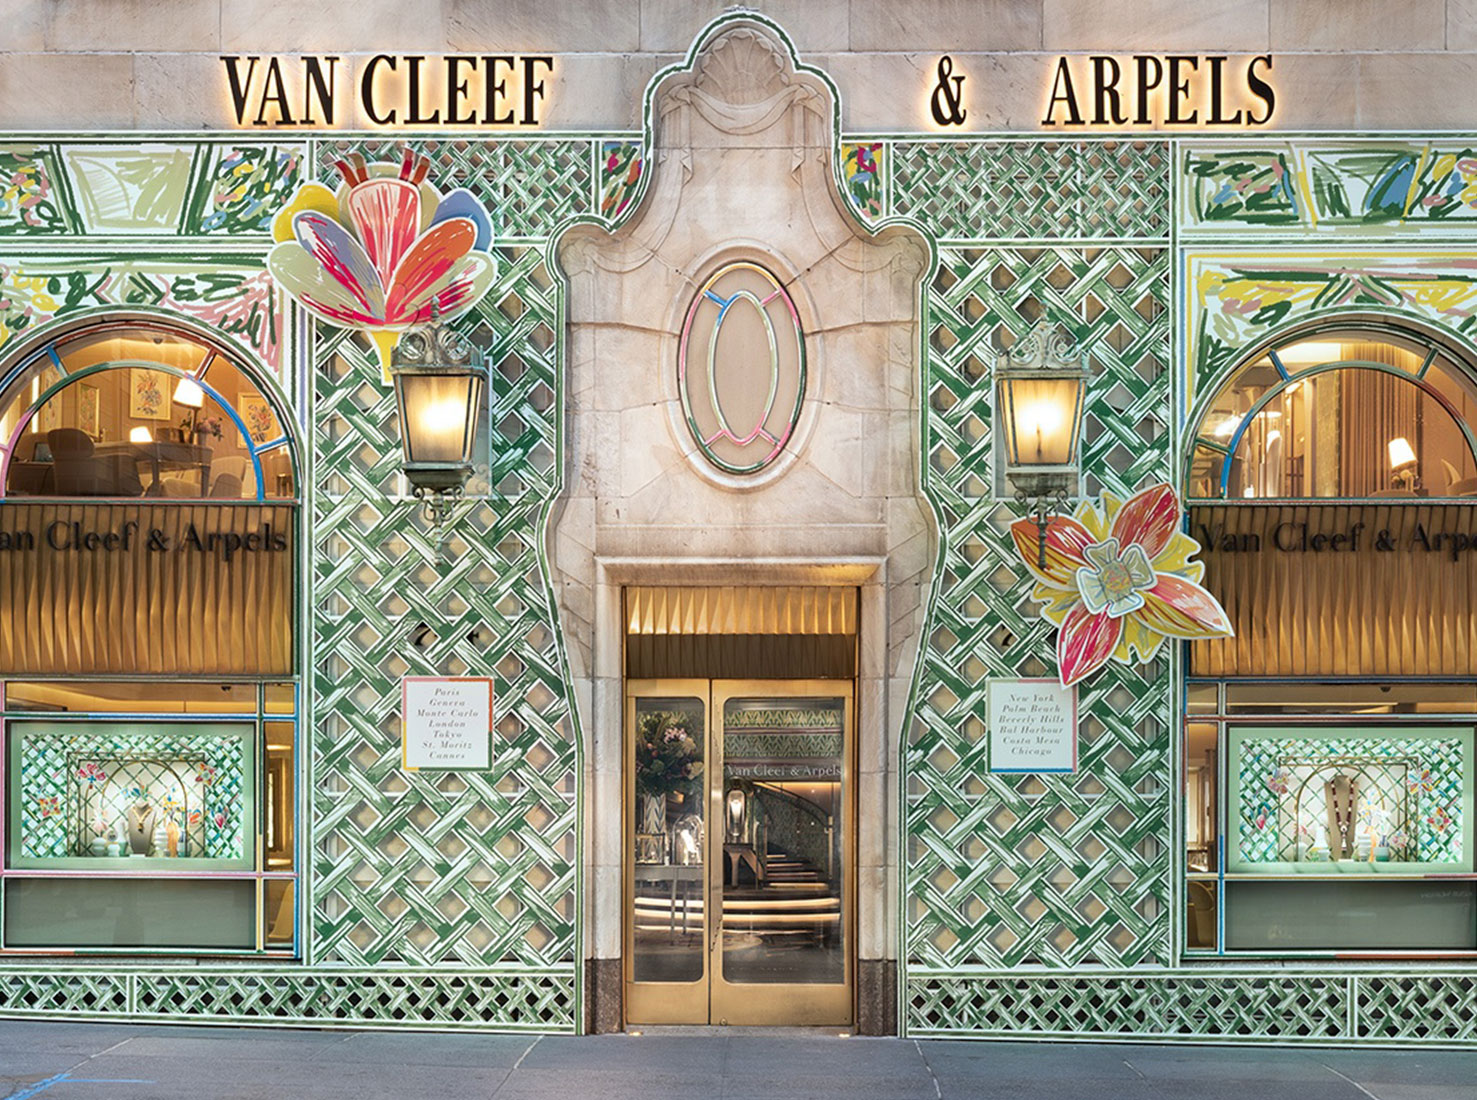 Бутик Van Cleef & Arpels Нью-йорк фото